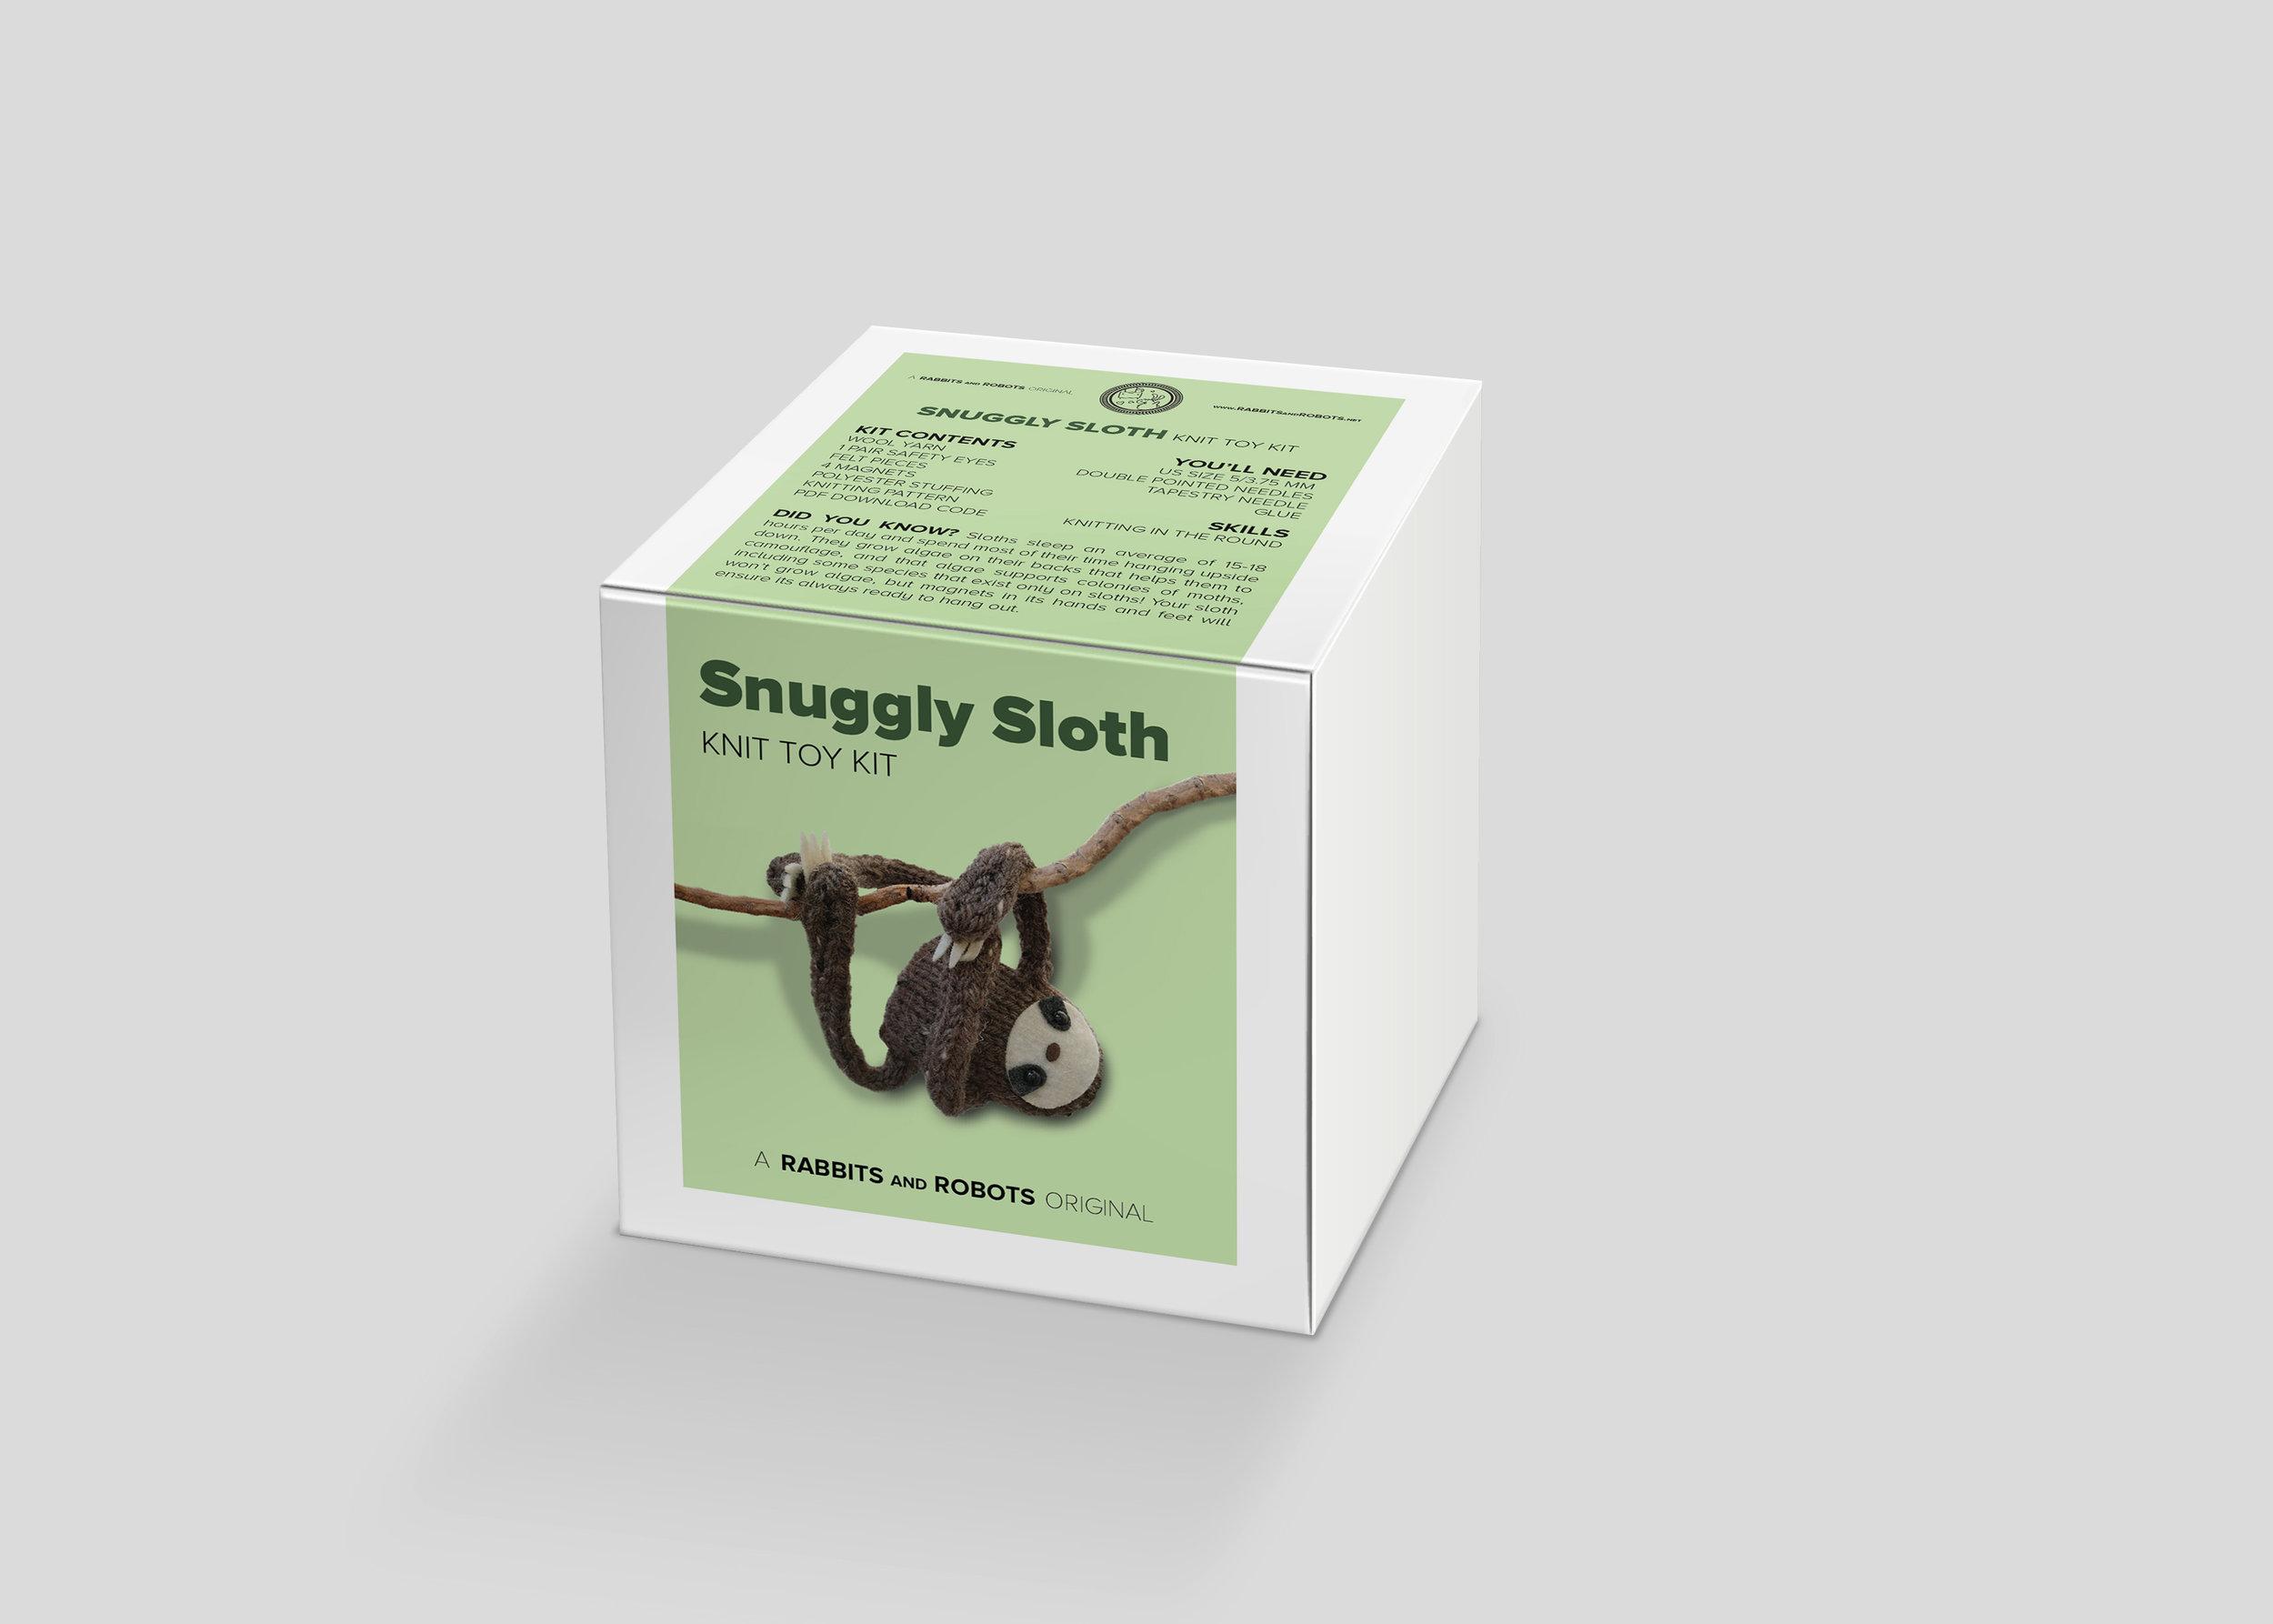 Sloth_Box _Mock-up_001.jpg